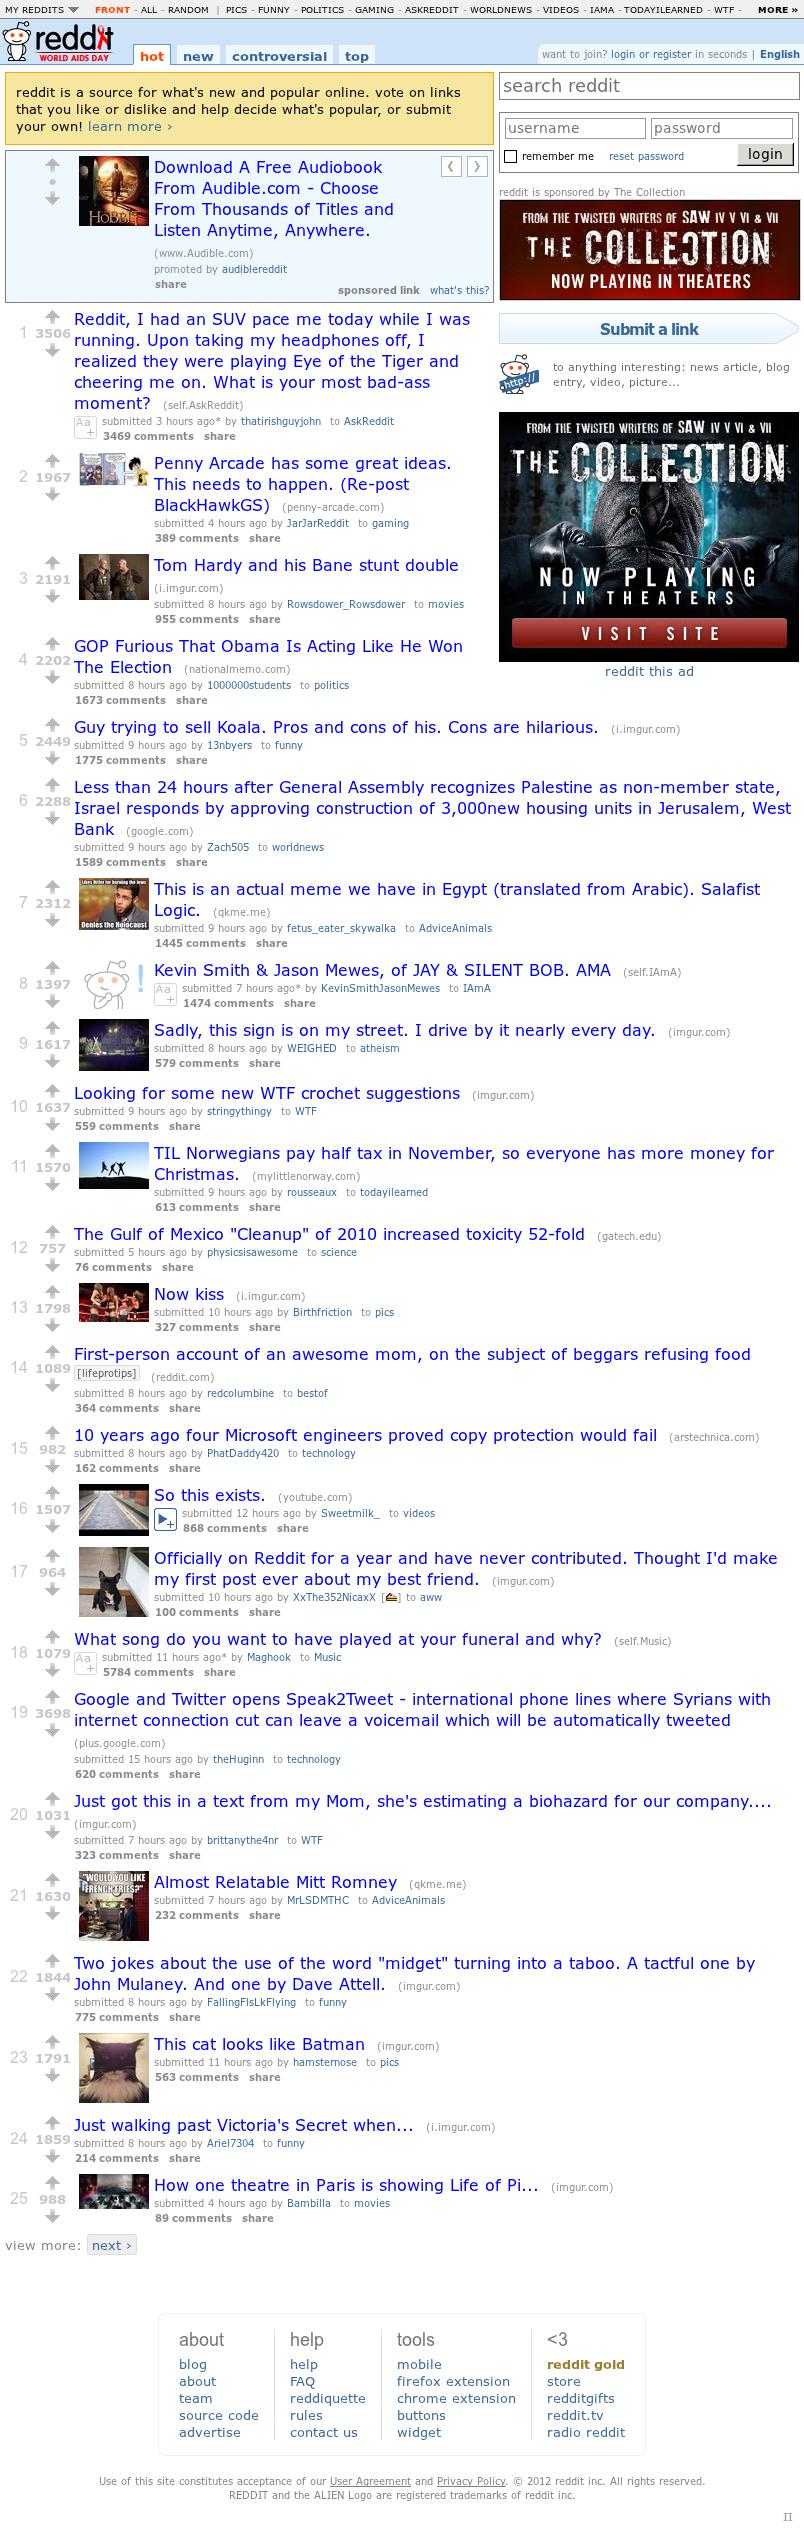 Reddit at Saturday Dec. 1, 2012, 12:30 a.m. UTC